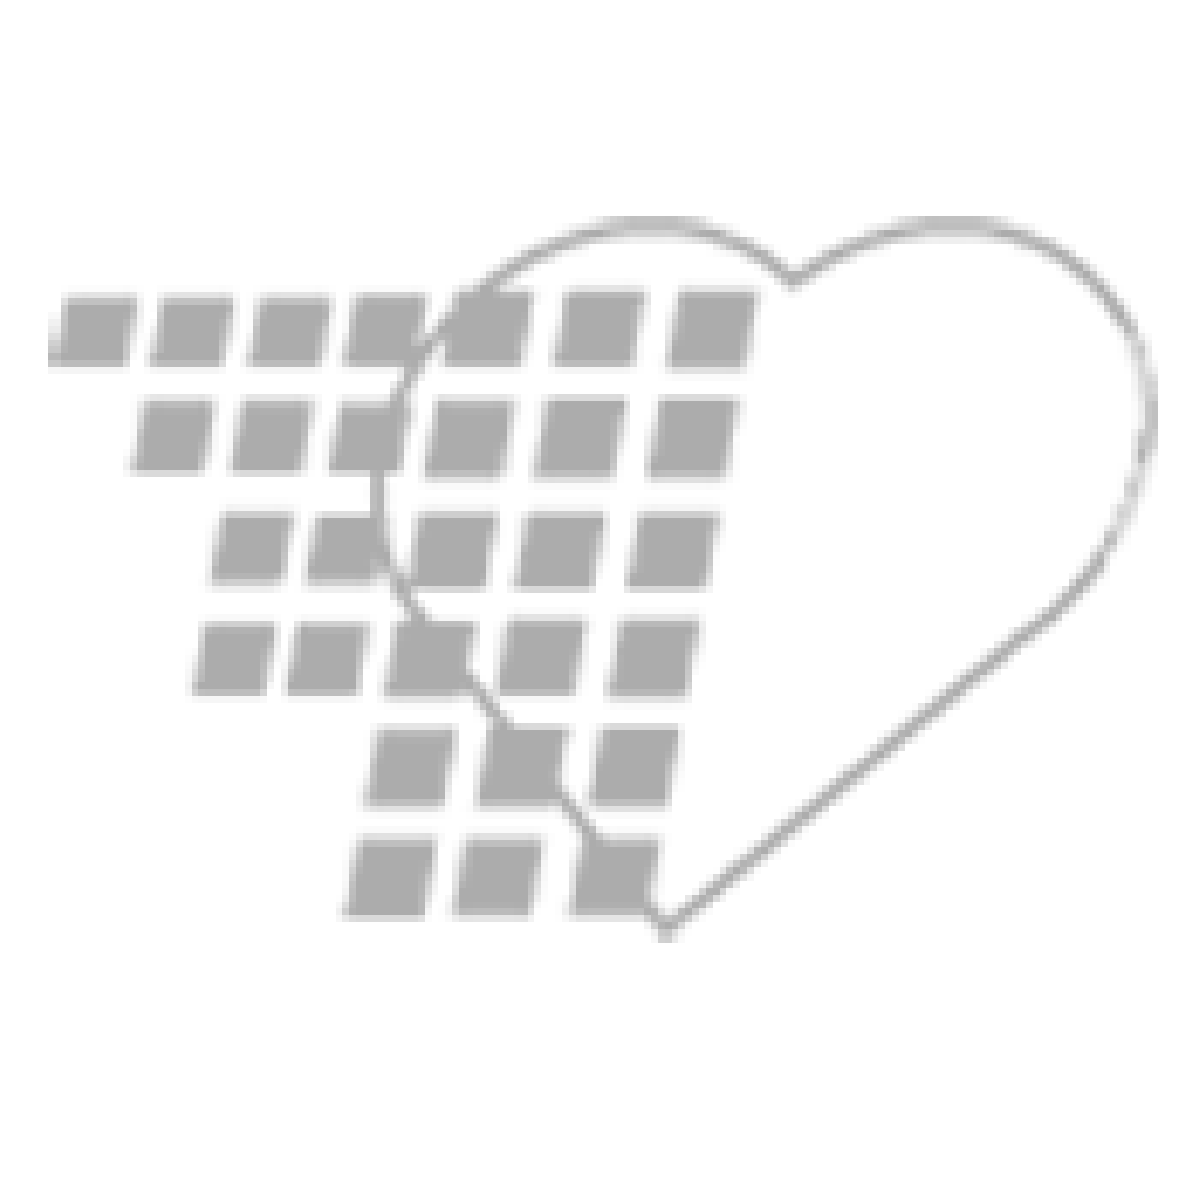 06-93-0051 - Demo Dose® Toprl XL 25 mg - 100 Pills/Box